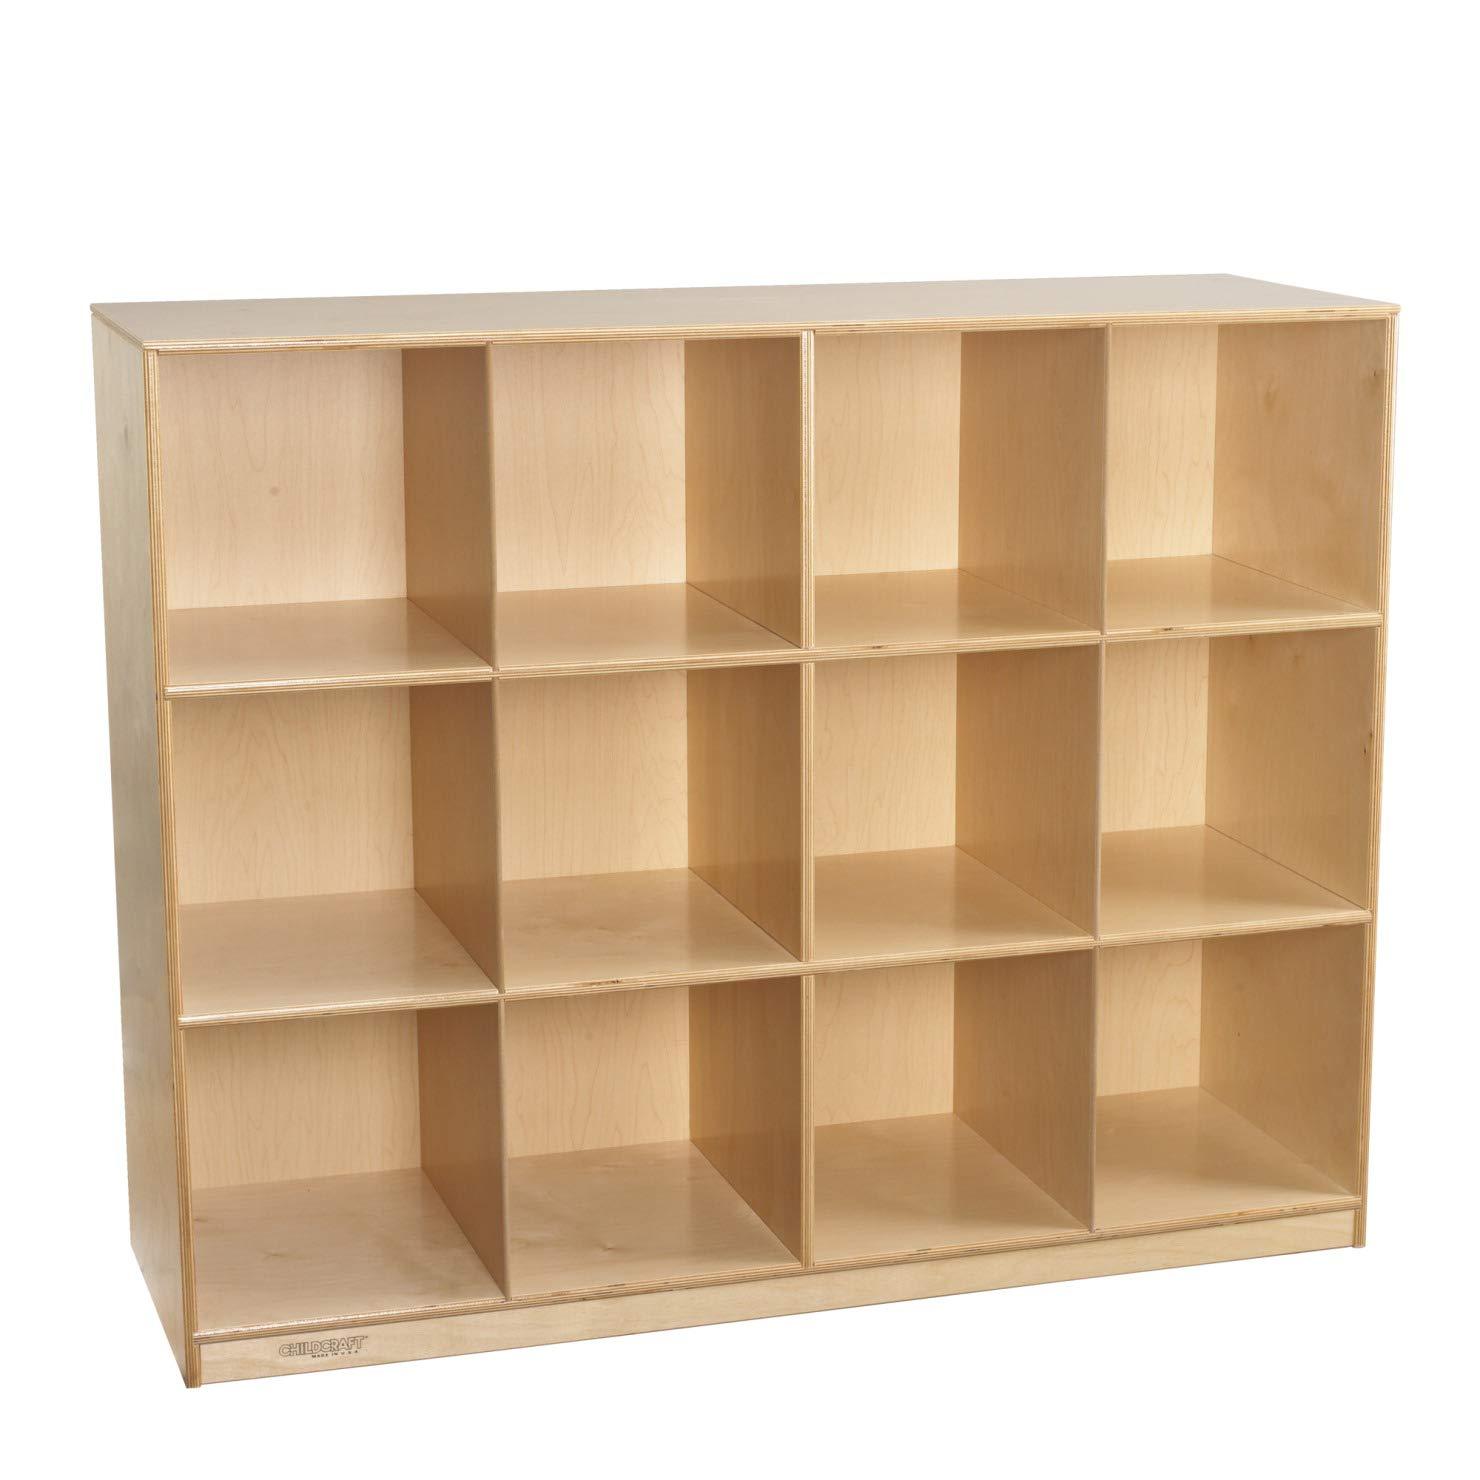 Childcraft 1464173 Mobile Mini Storage Locker, 12-Cubby, Wood, 51-1/2'' x 16-7/8'' x 42'', Natural Wood Tone